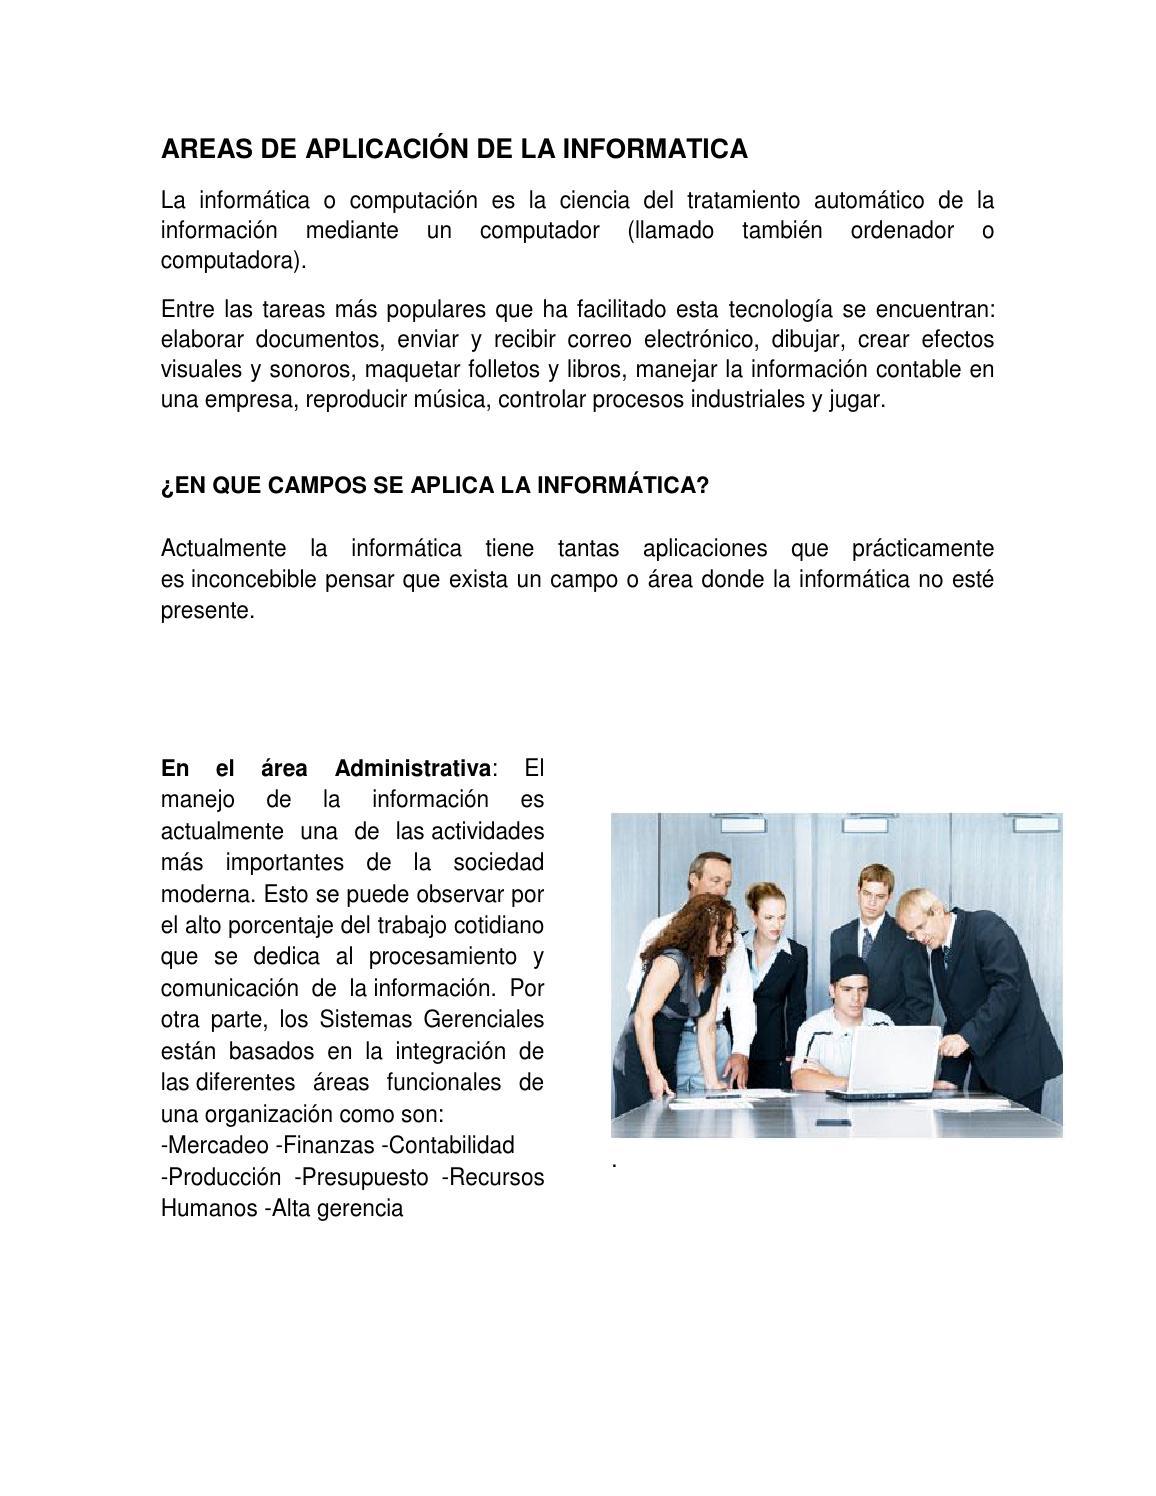 Areas donde se aplica la informatica by Yessika Peña - issuu